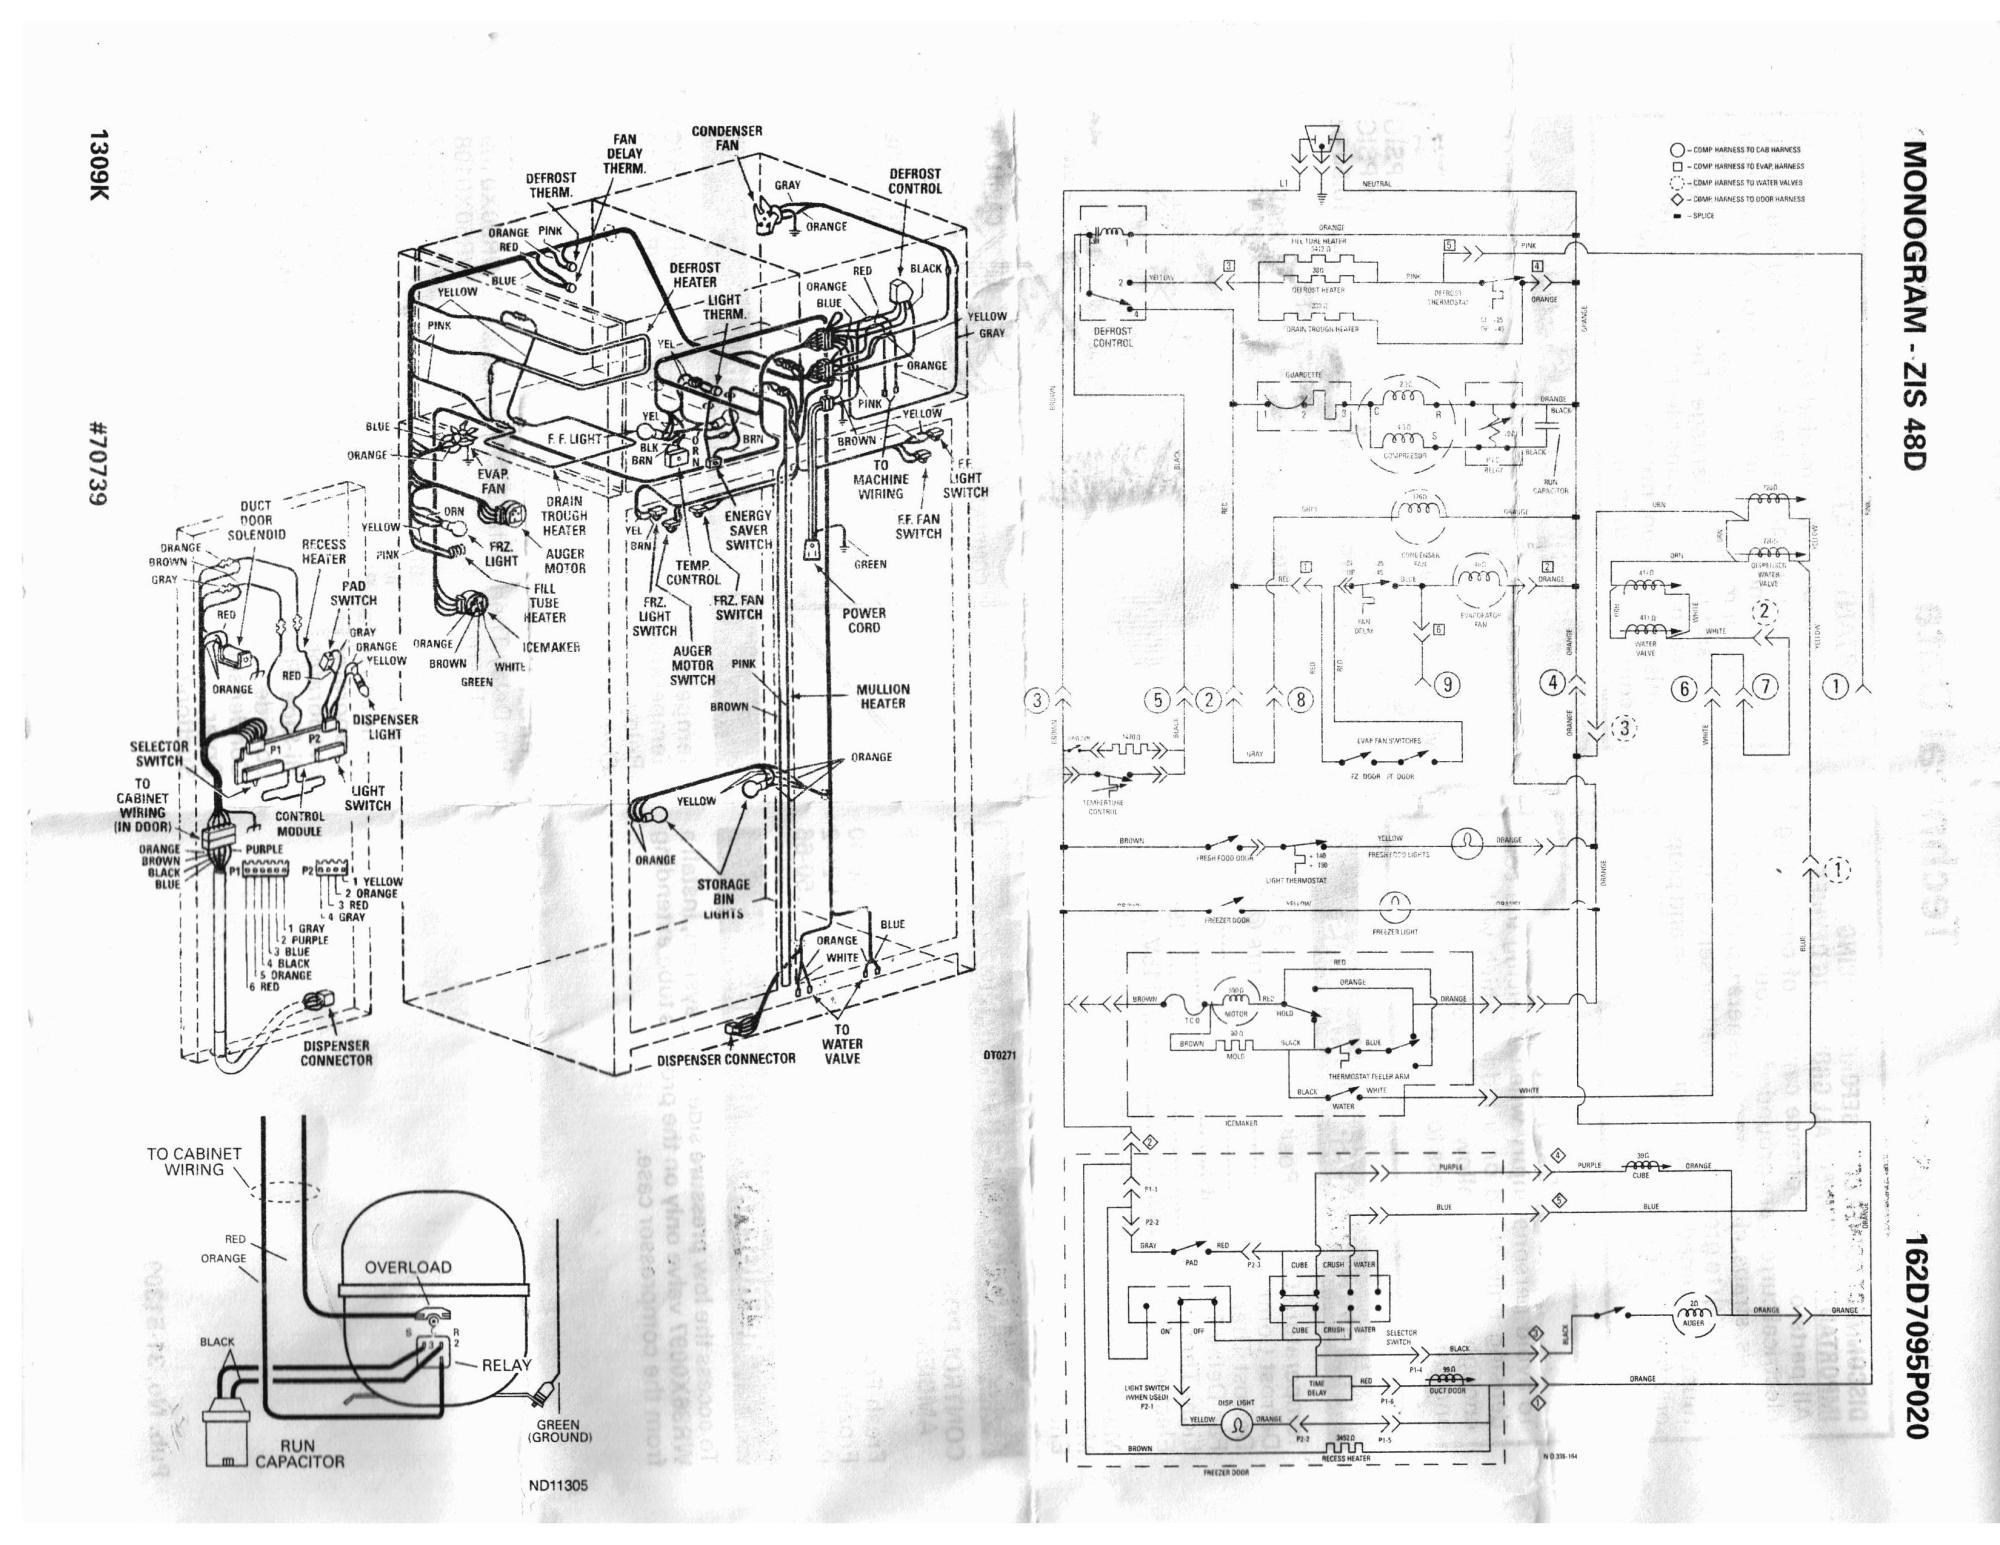 hight resolution of whirlpool gold wiring diagram whirlpool free engine ge gss201emd ww side by side refrigerator wiring diagram